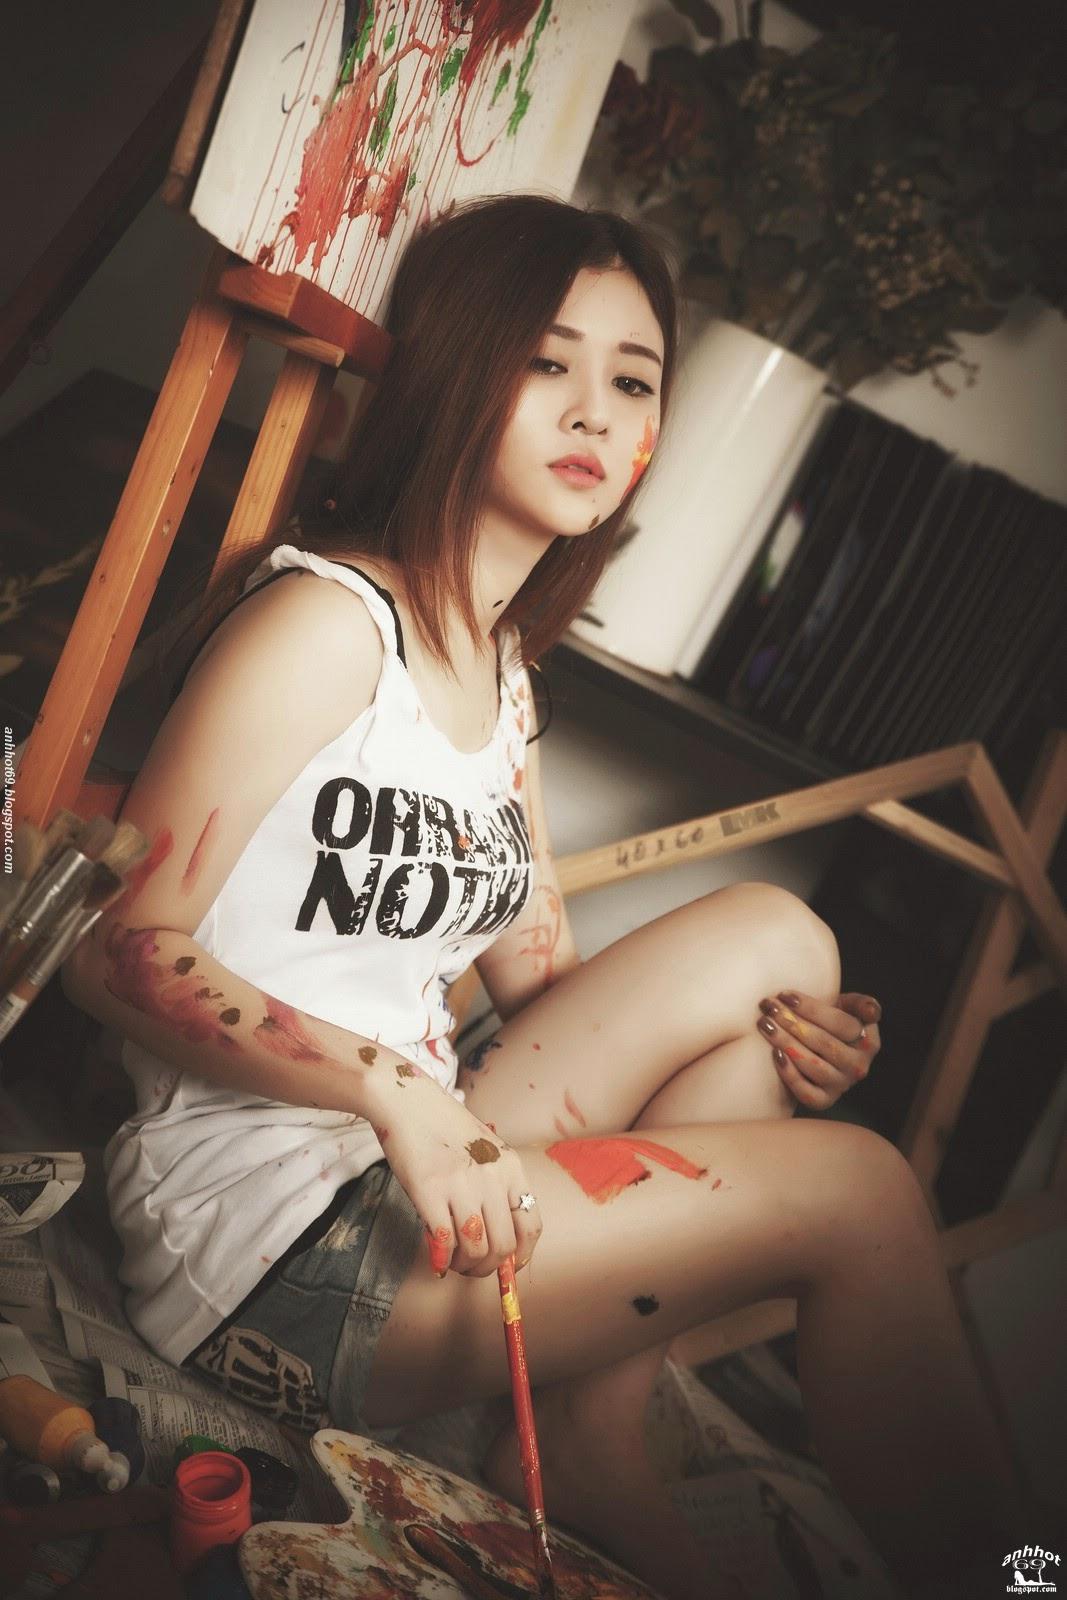 Ribi_Sachi-The_Artist-9711314092_b698239a3e_h